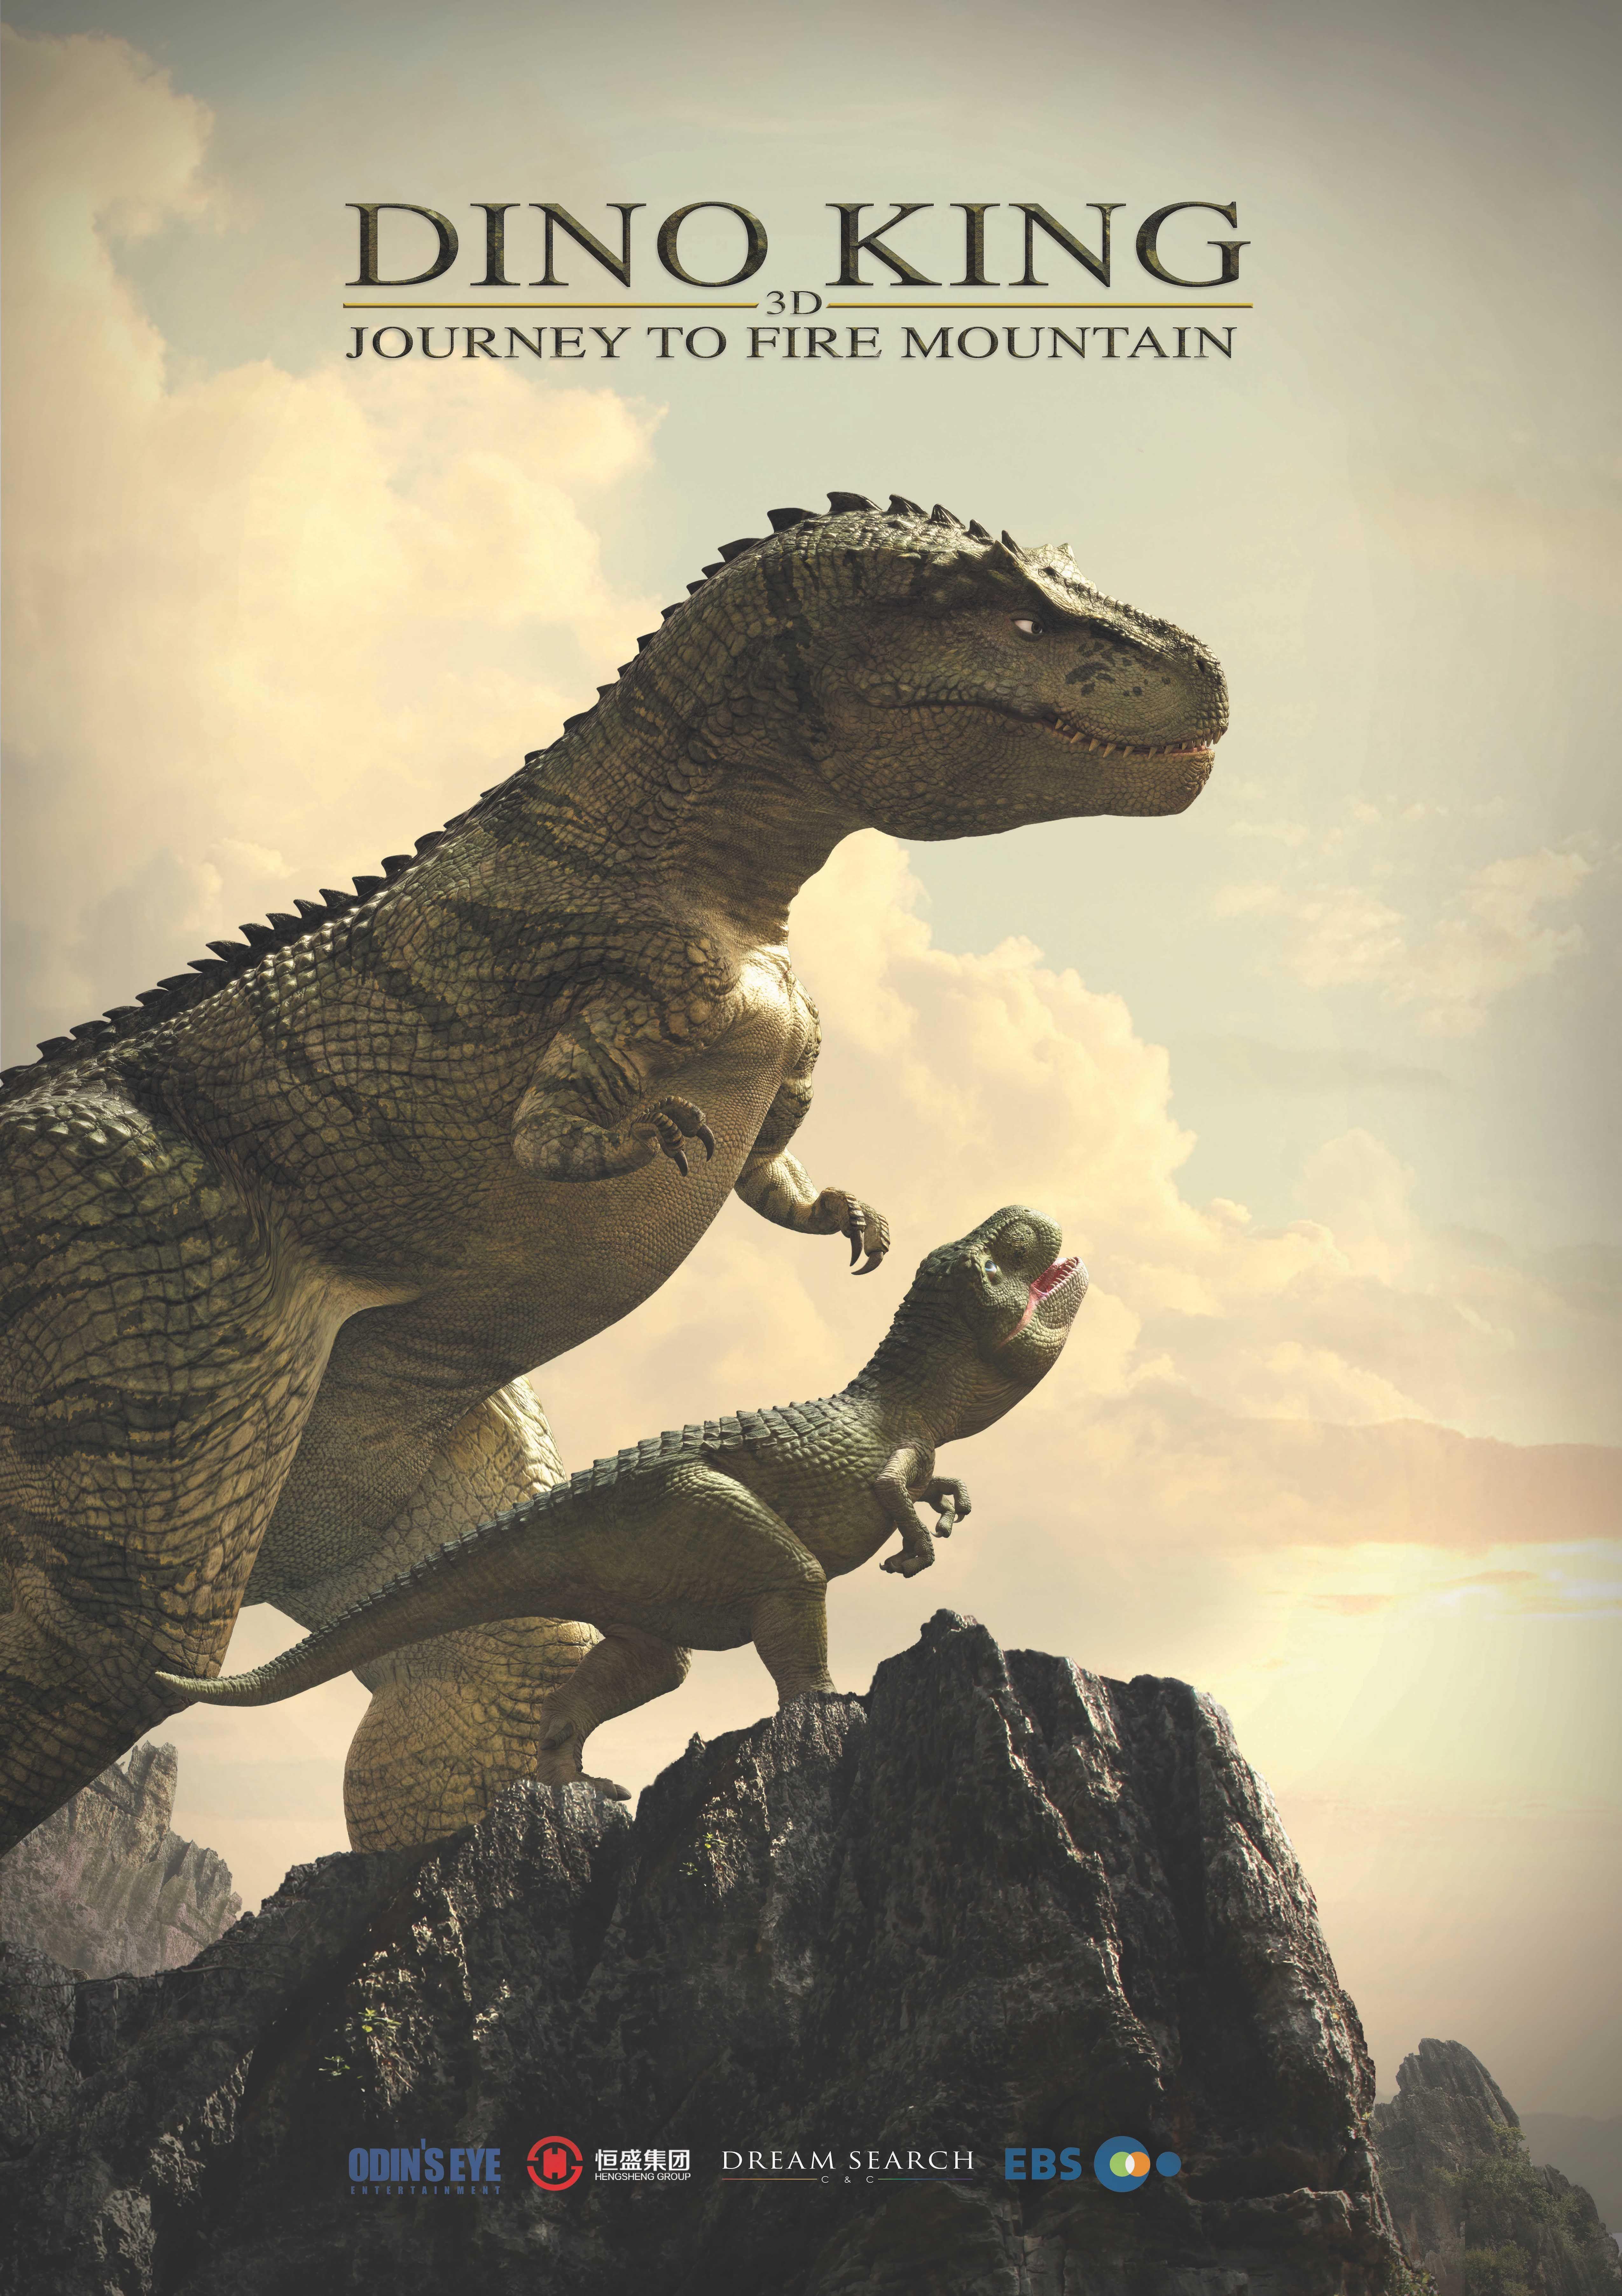 Dino king 2 journey to fire mountain movie poster https